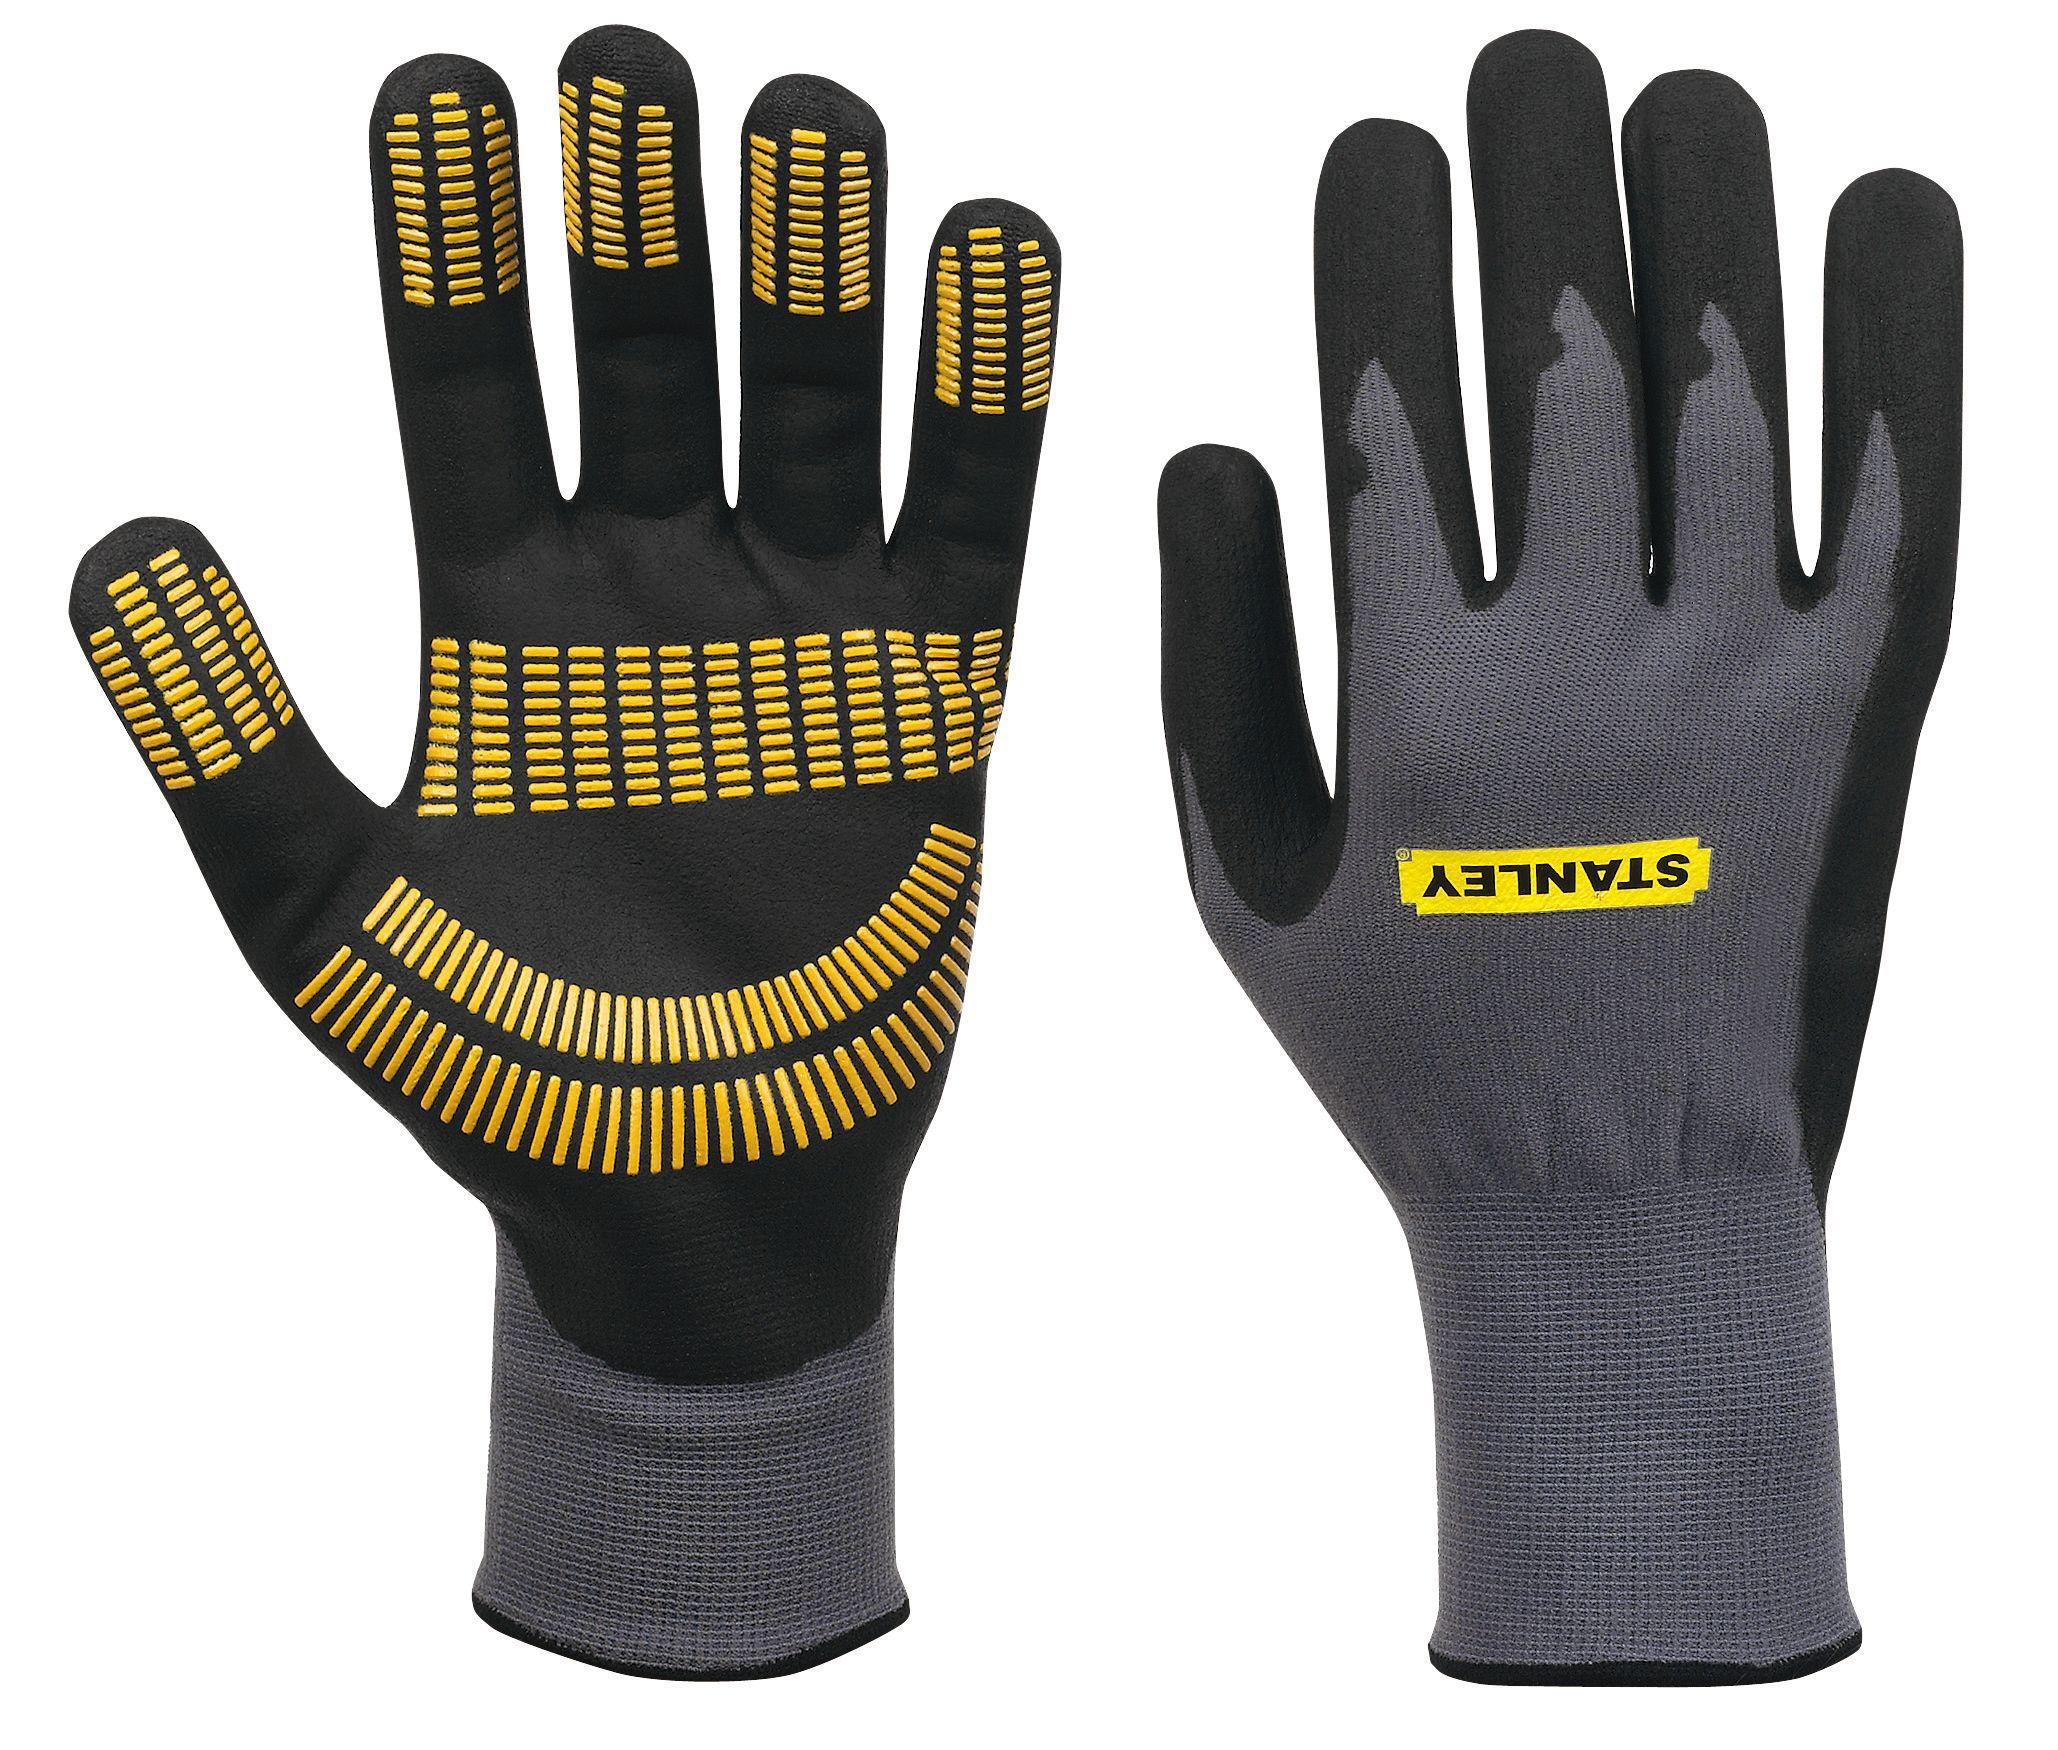 Stanley Large Nitrile Razor Gripper Gloves Departments